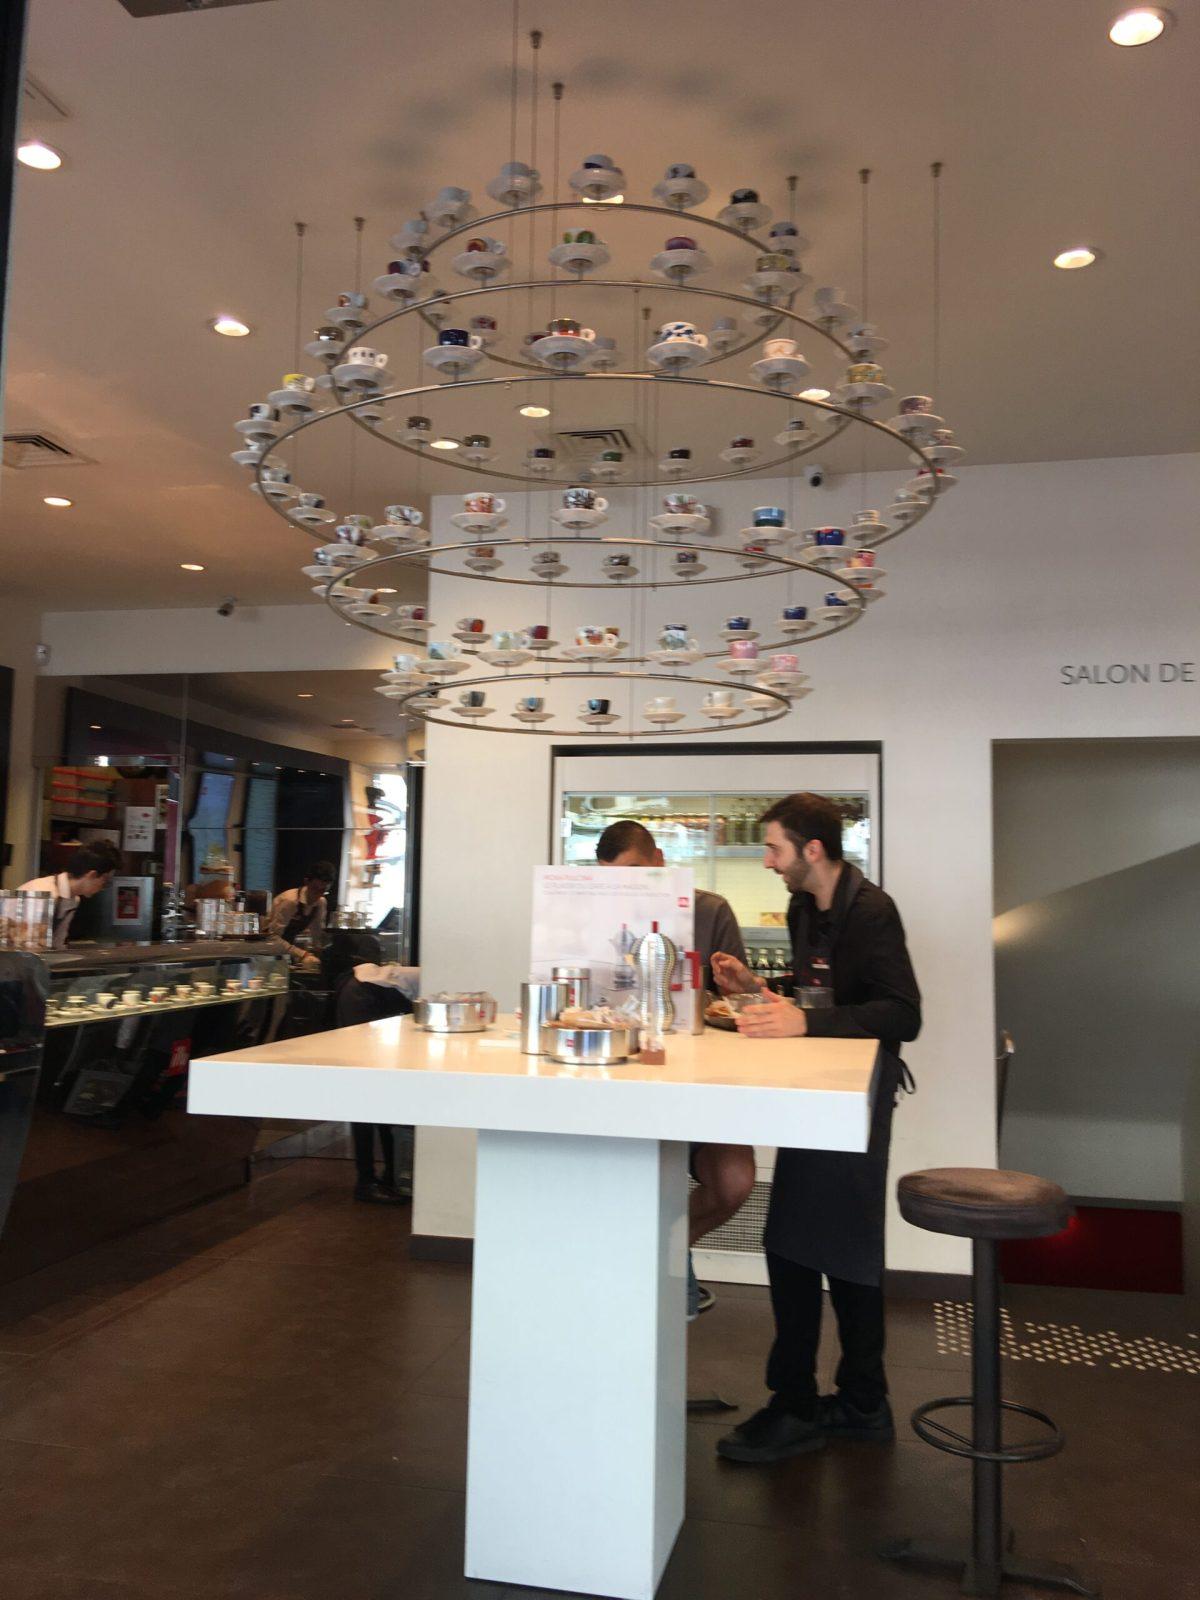 Coffee shop in Paris, France